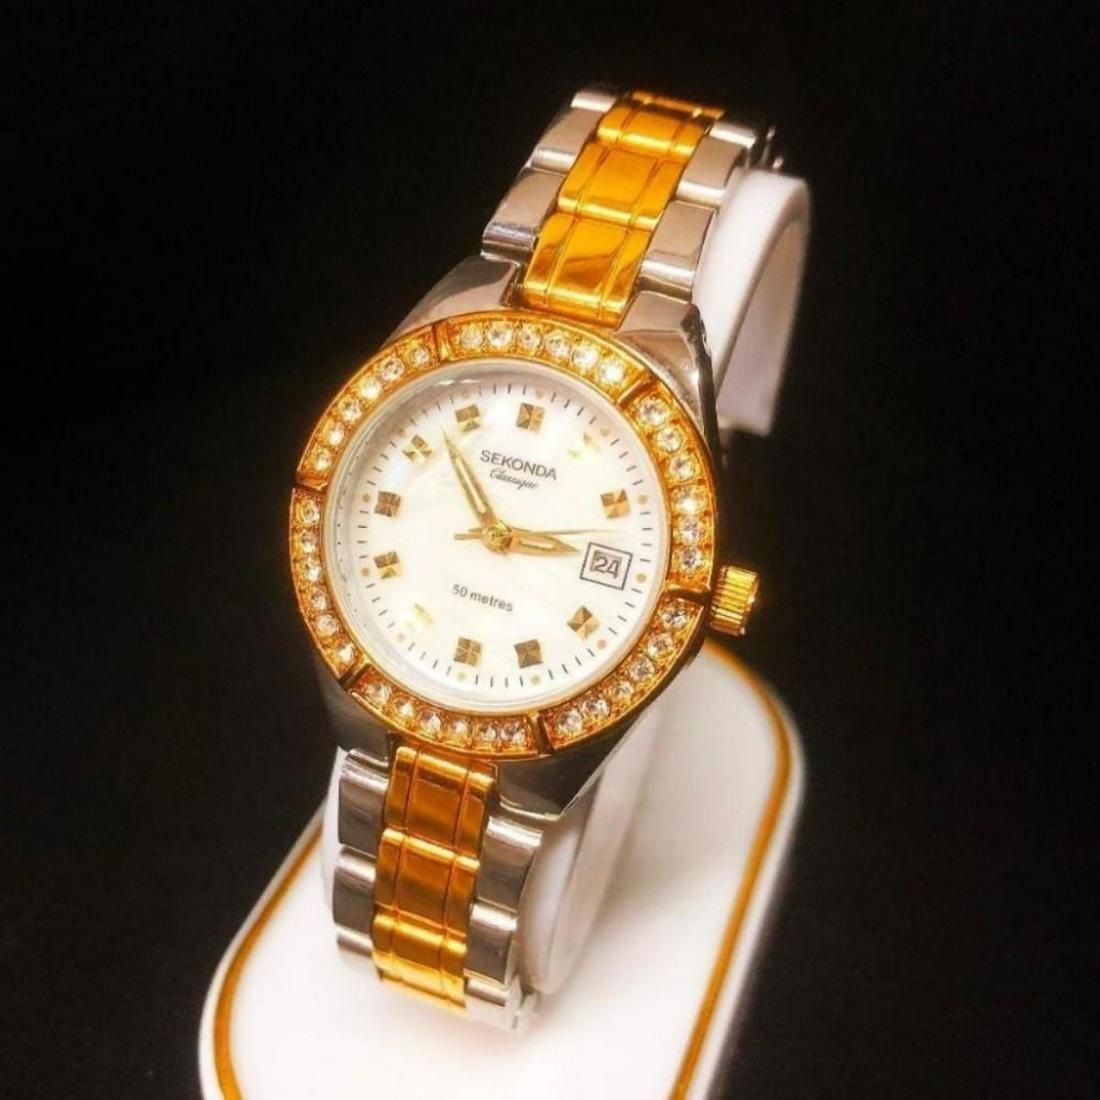 Ladies Gold and Silver Tone Sekonda Classique Wrist